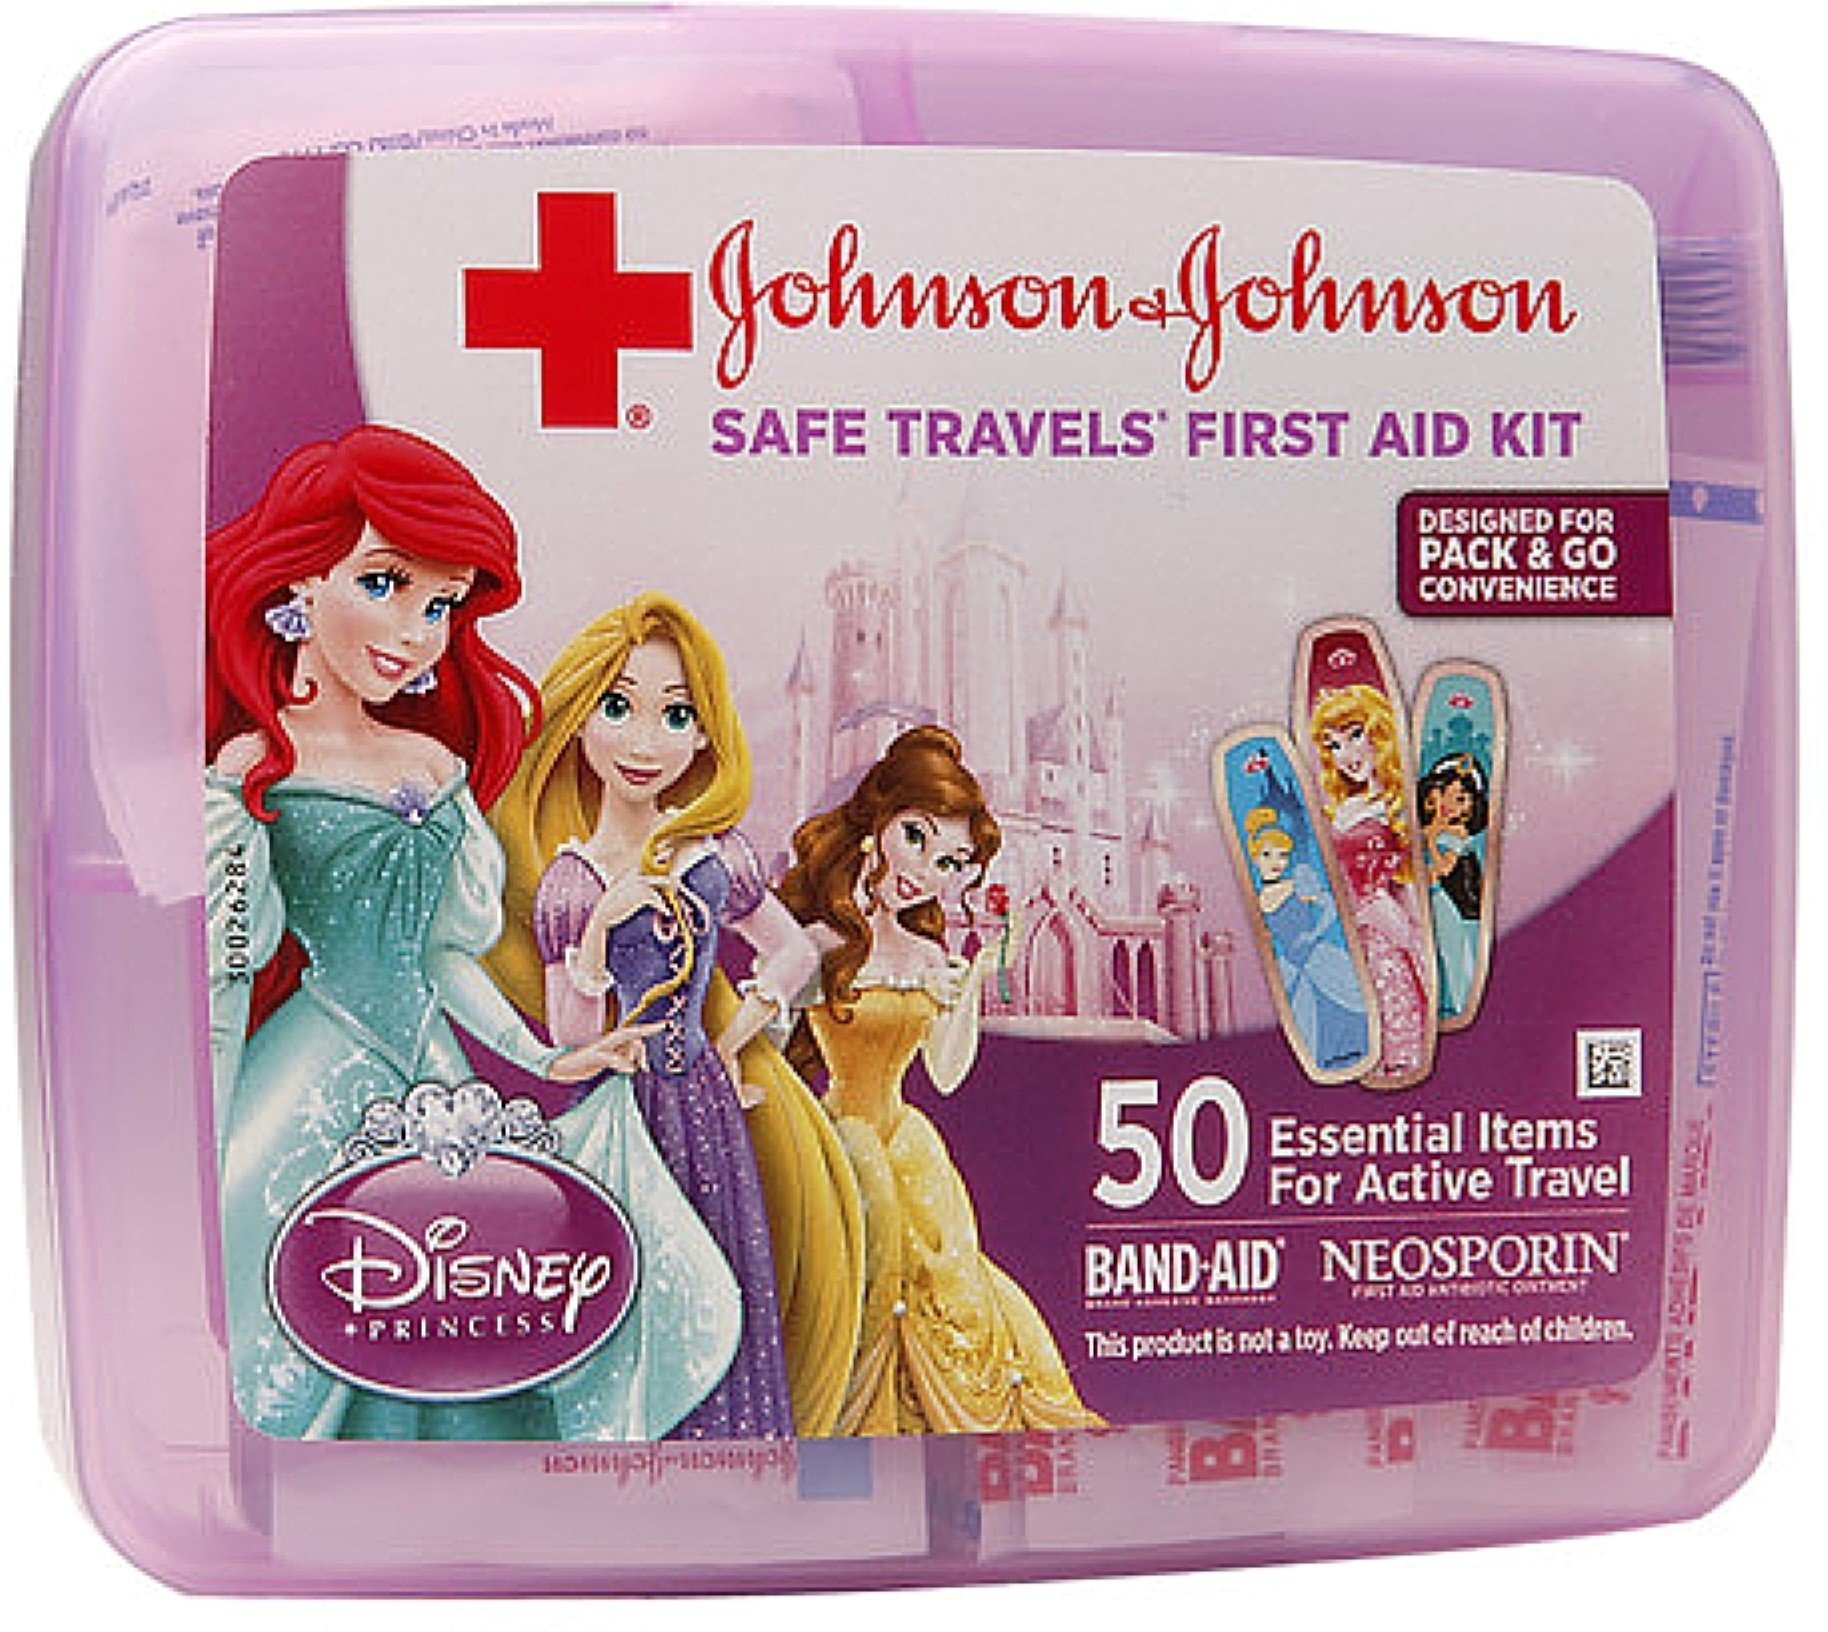 JOHNSON & JOHNSON Safe Travels 50 Essential Items First Aid Kit, Disney Princess 1 ea (12 Pack) by Pharmapacks (Image #1)